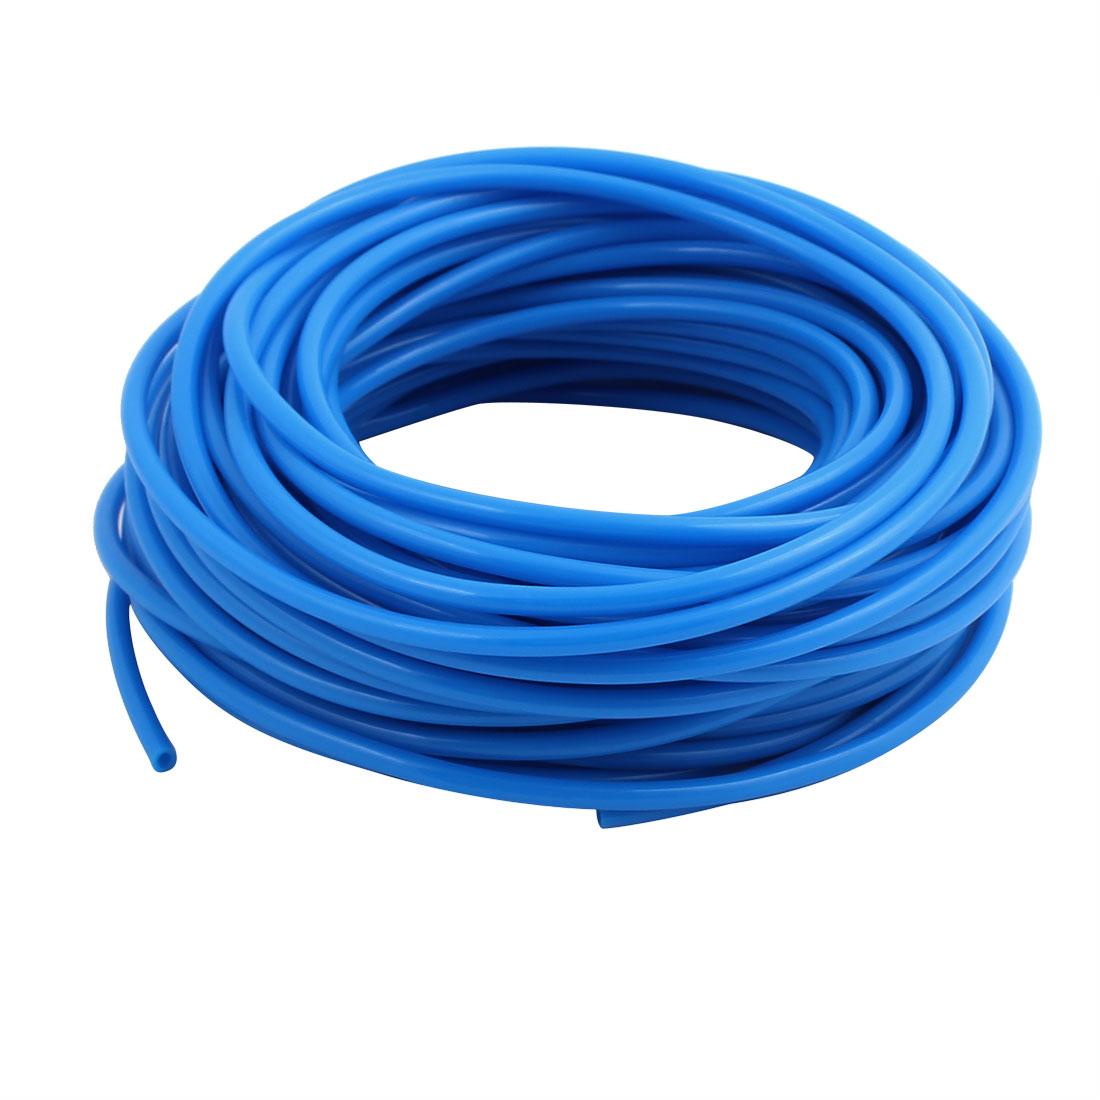 2.5mm x 4mm Flexible Pneumatic Polyurethane PU Hose Pipe Tube Blue 18m Length